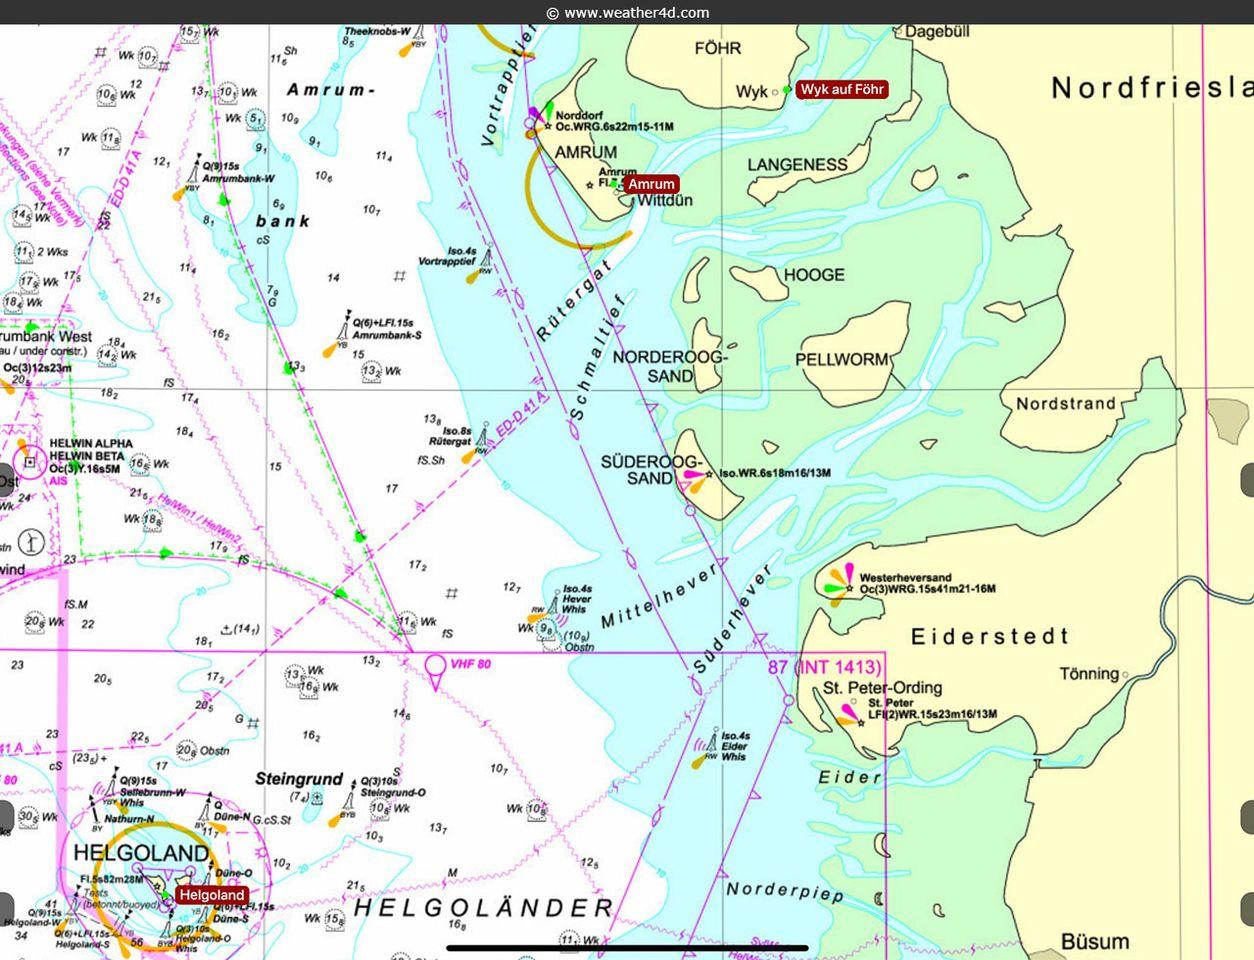 Helgoland - Föhr